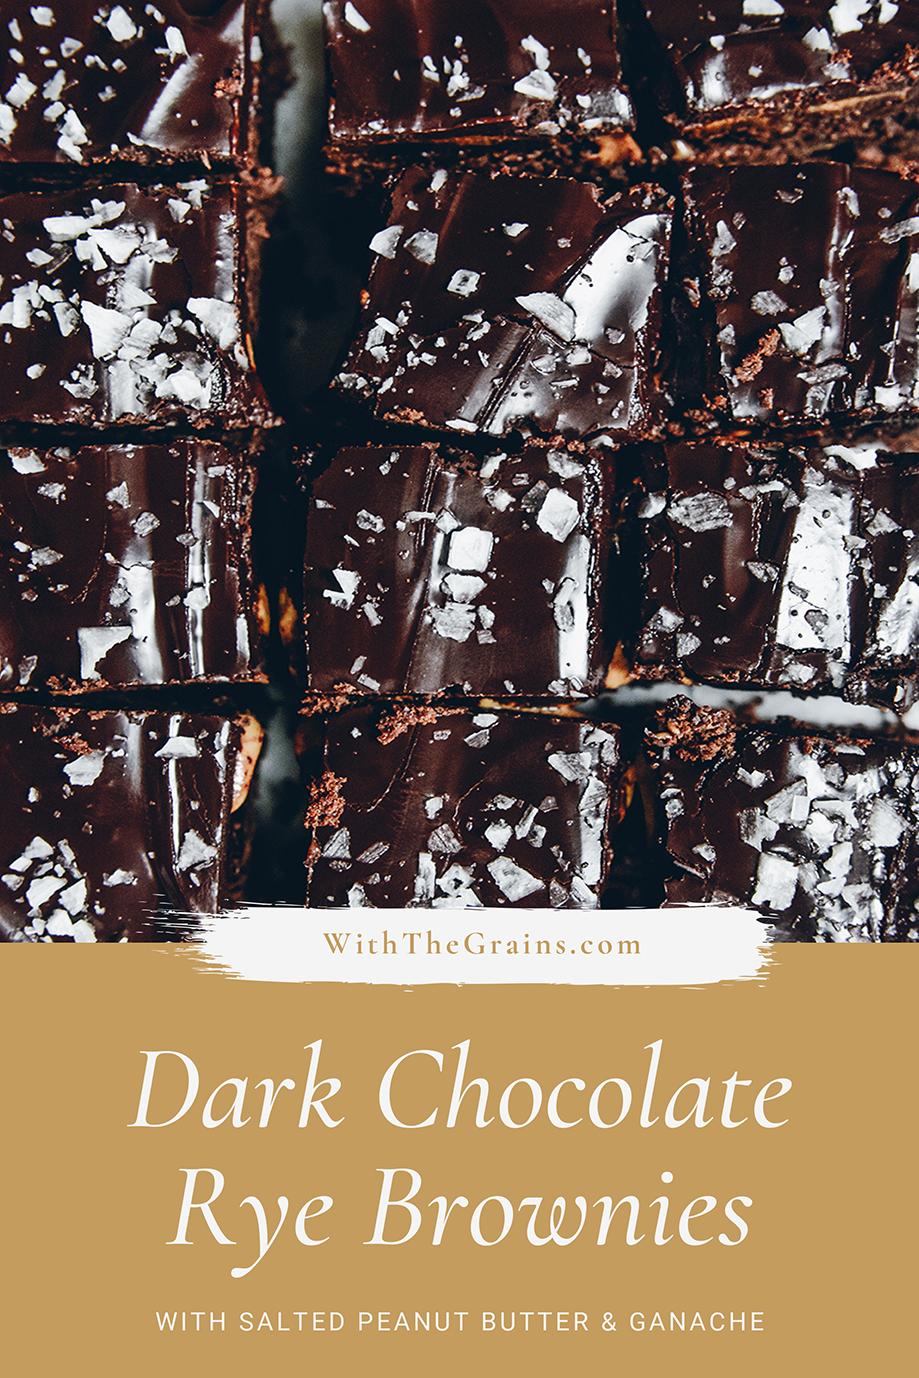 Dark Chocolate Rye Brownies with Salted Peanut Butter & Ganache // www.WithTheGrains.com